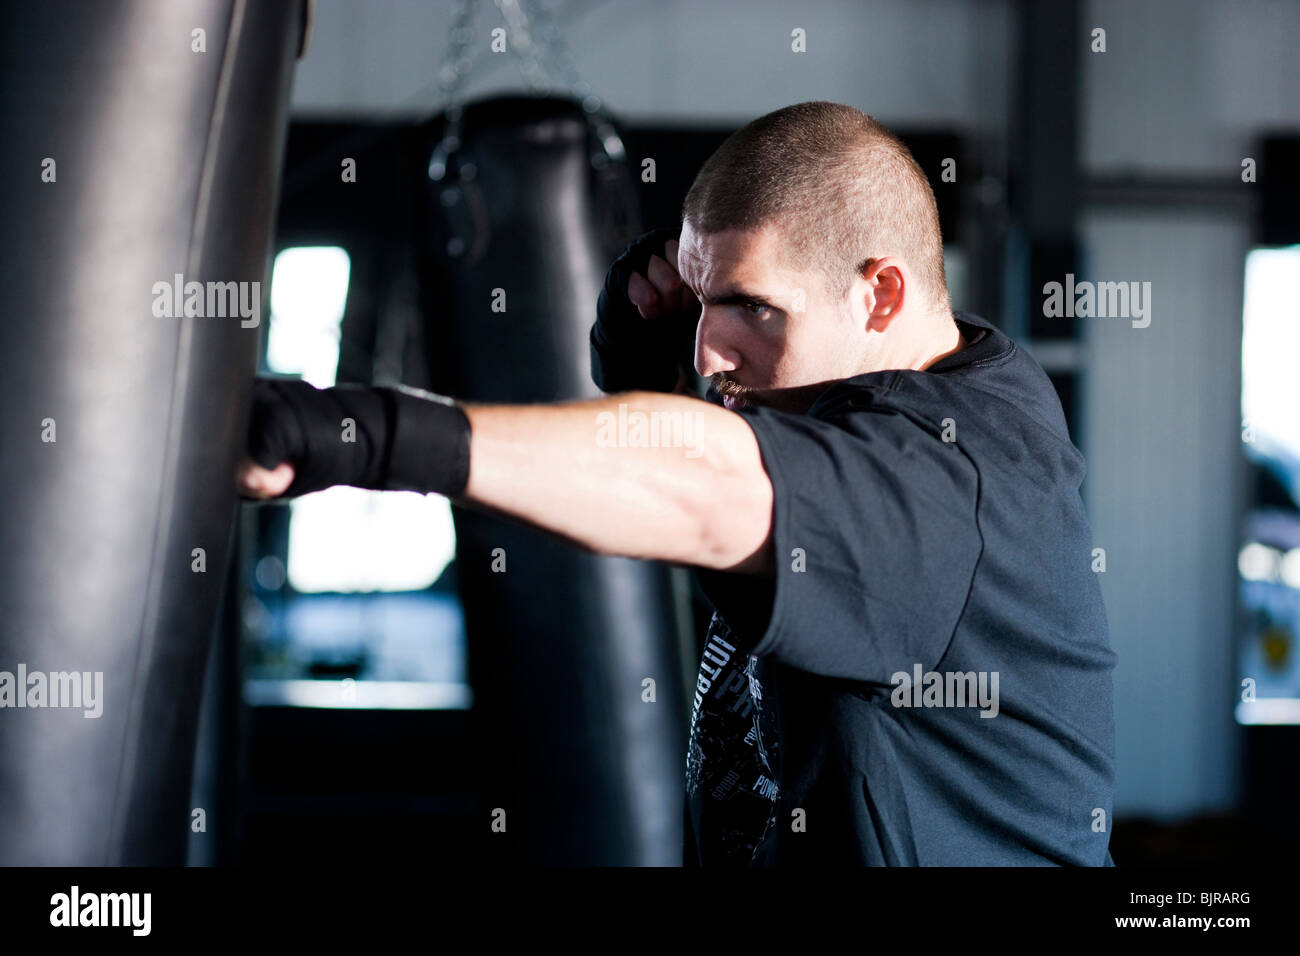 USA Utah, American forcella, Boxer punzonatura Sacco boxe Immagini Stock